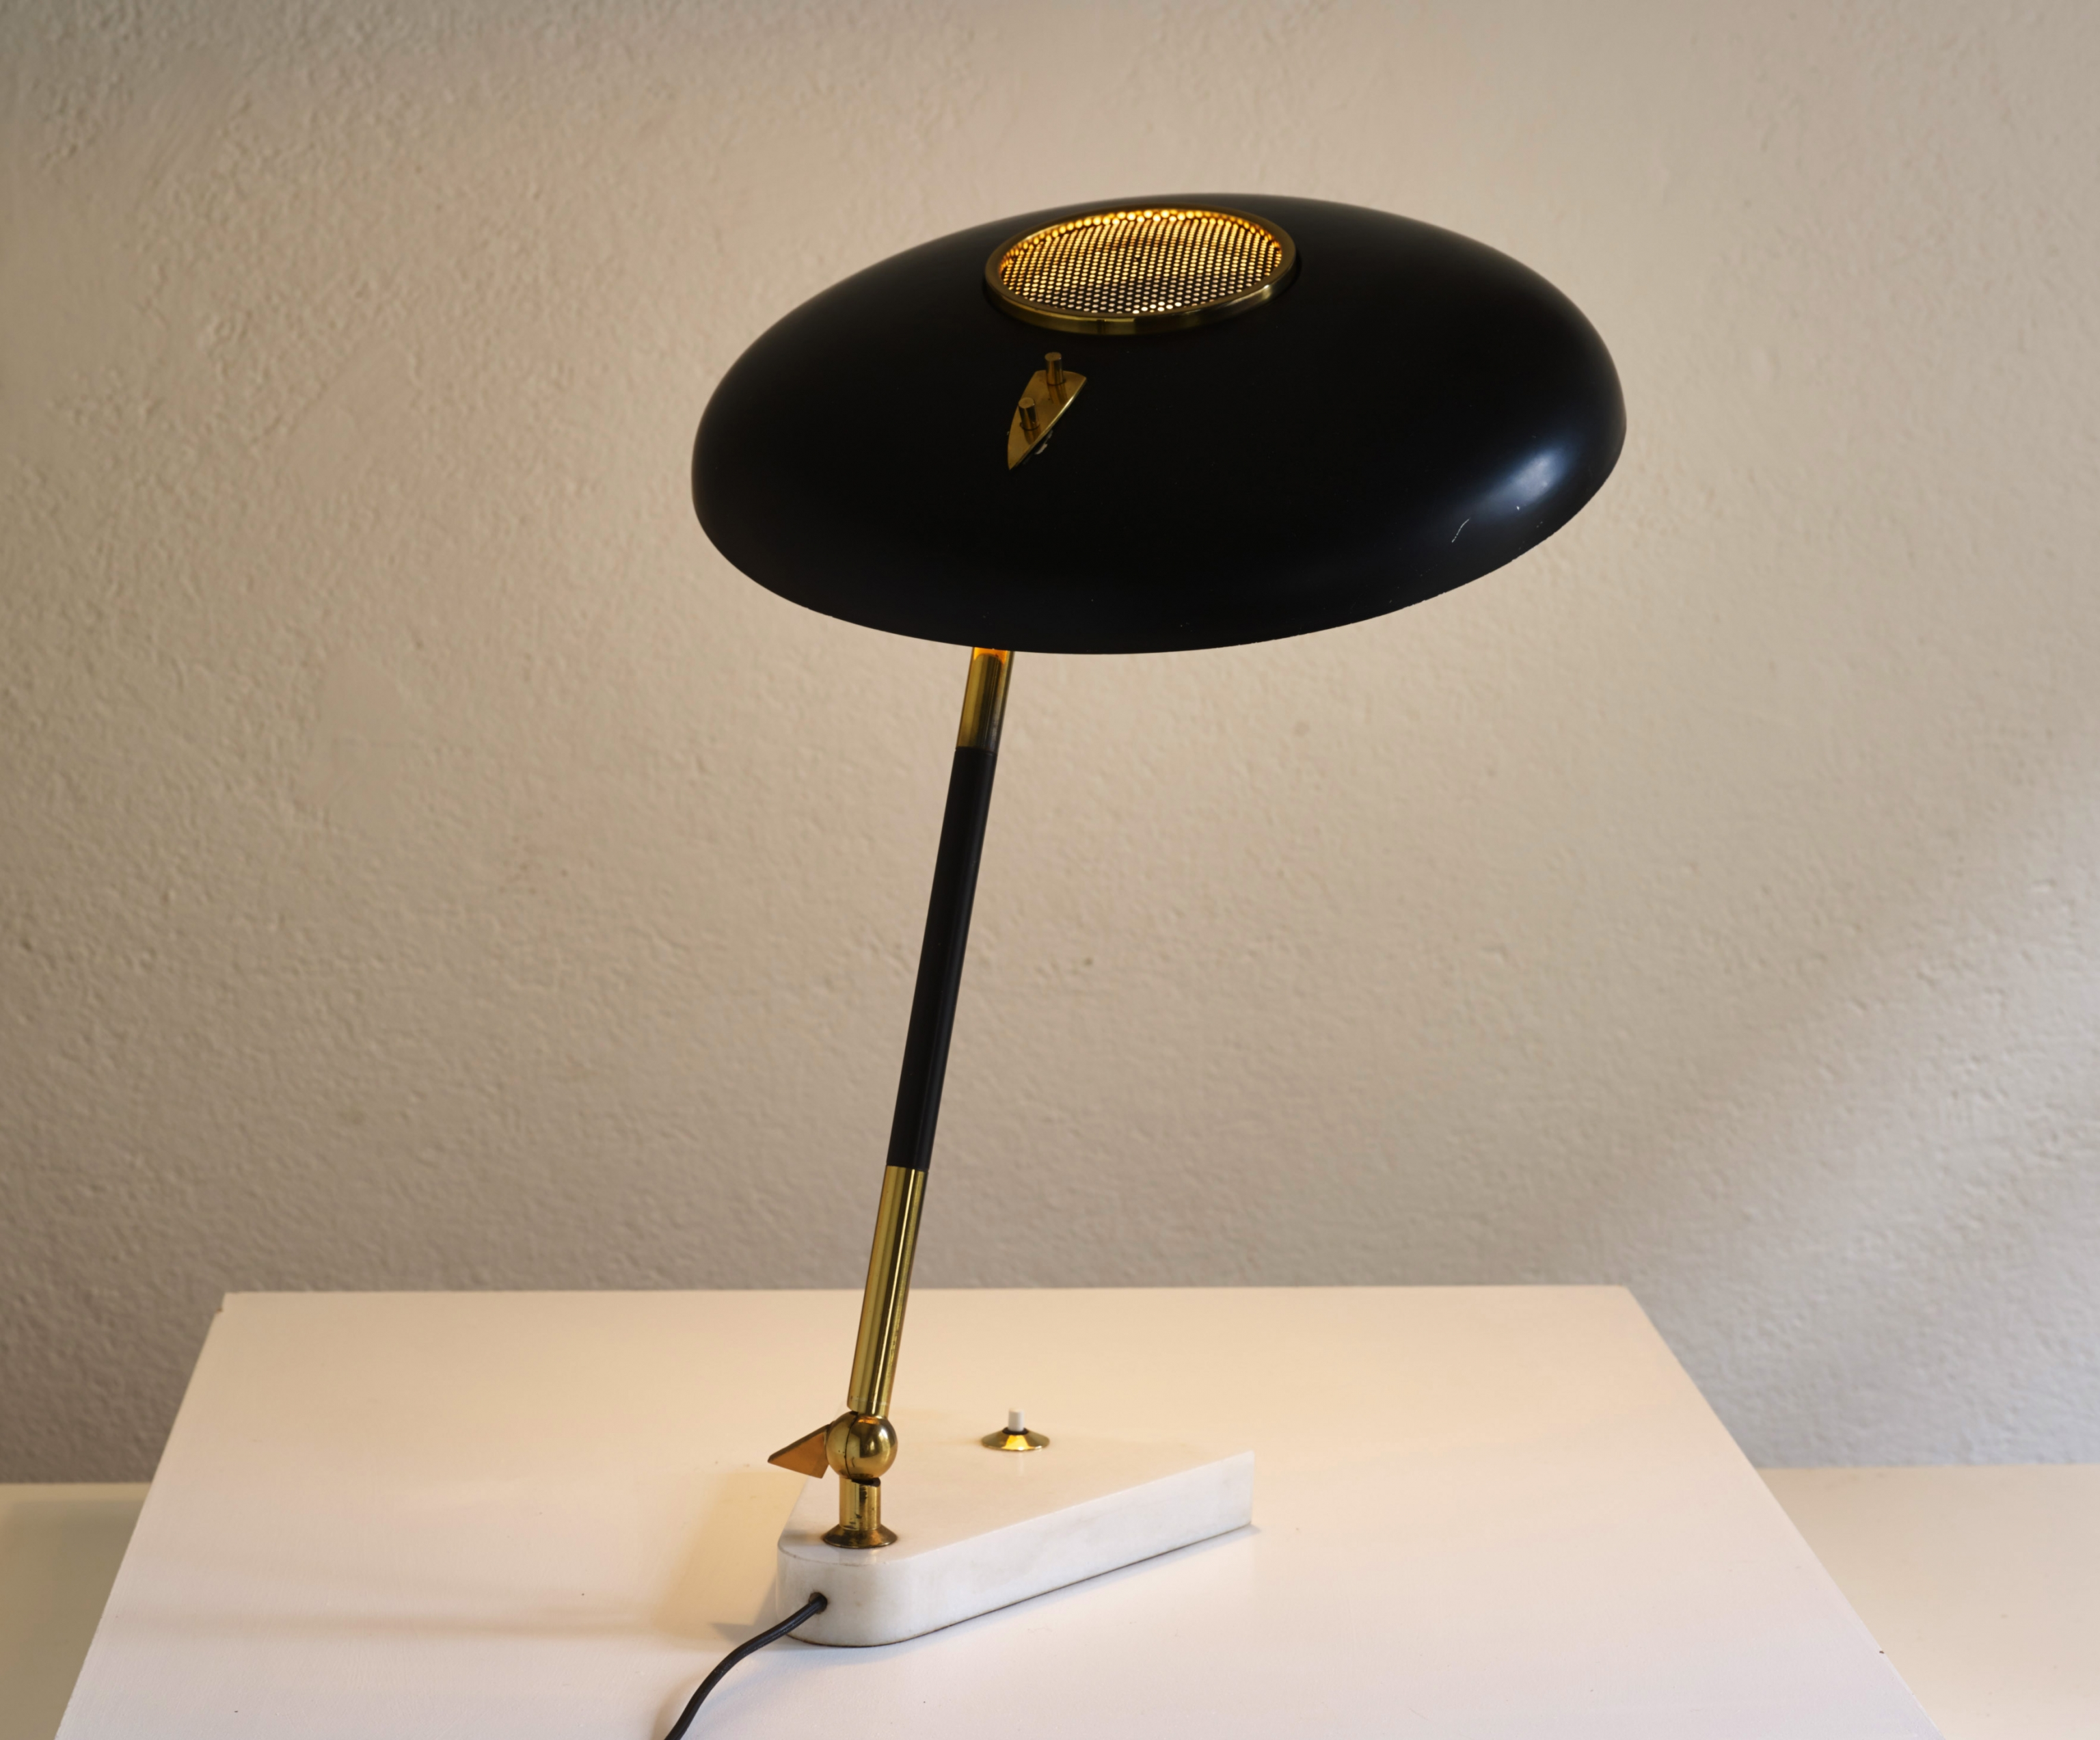 stilux-table-lamp-image-01